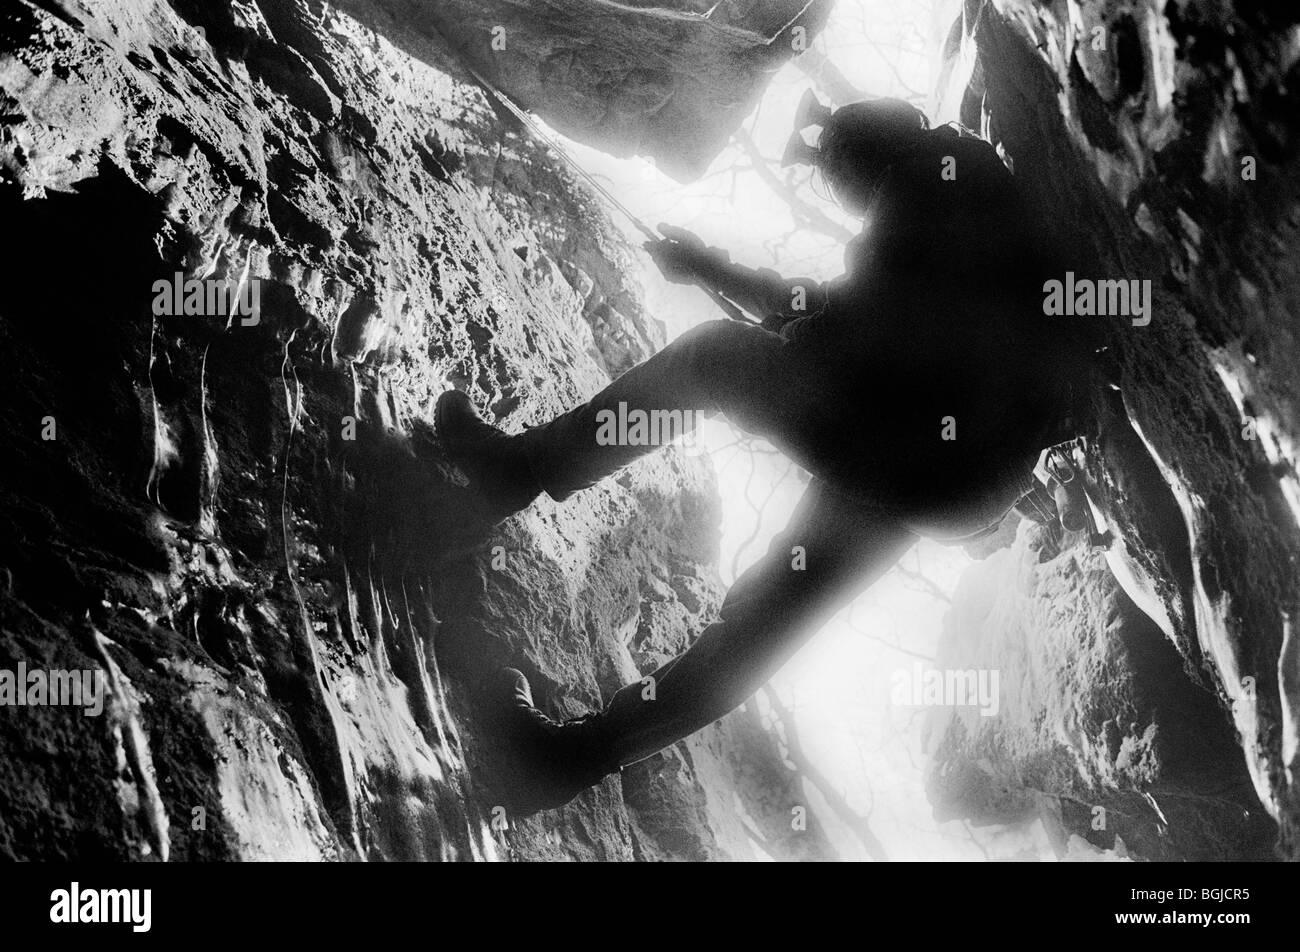 Cave explorer. Sweden. Stock Photo